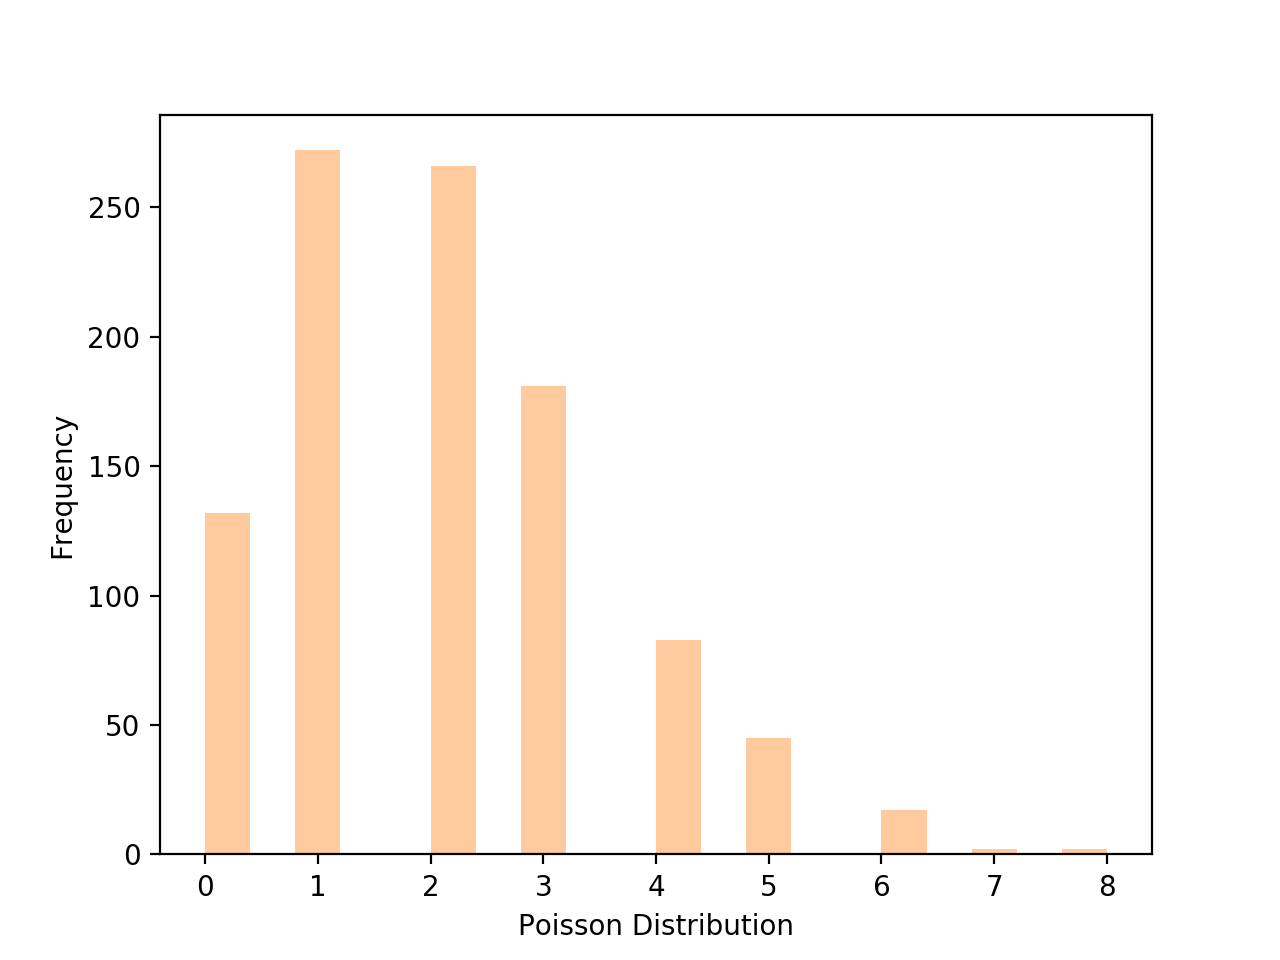 A Poisson distribution plot created using seaborn